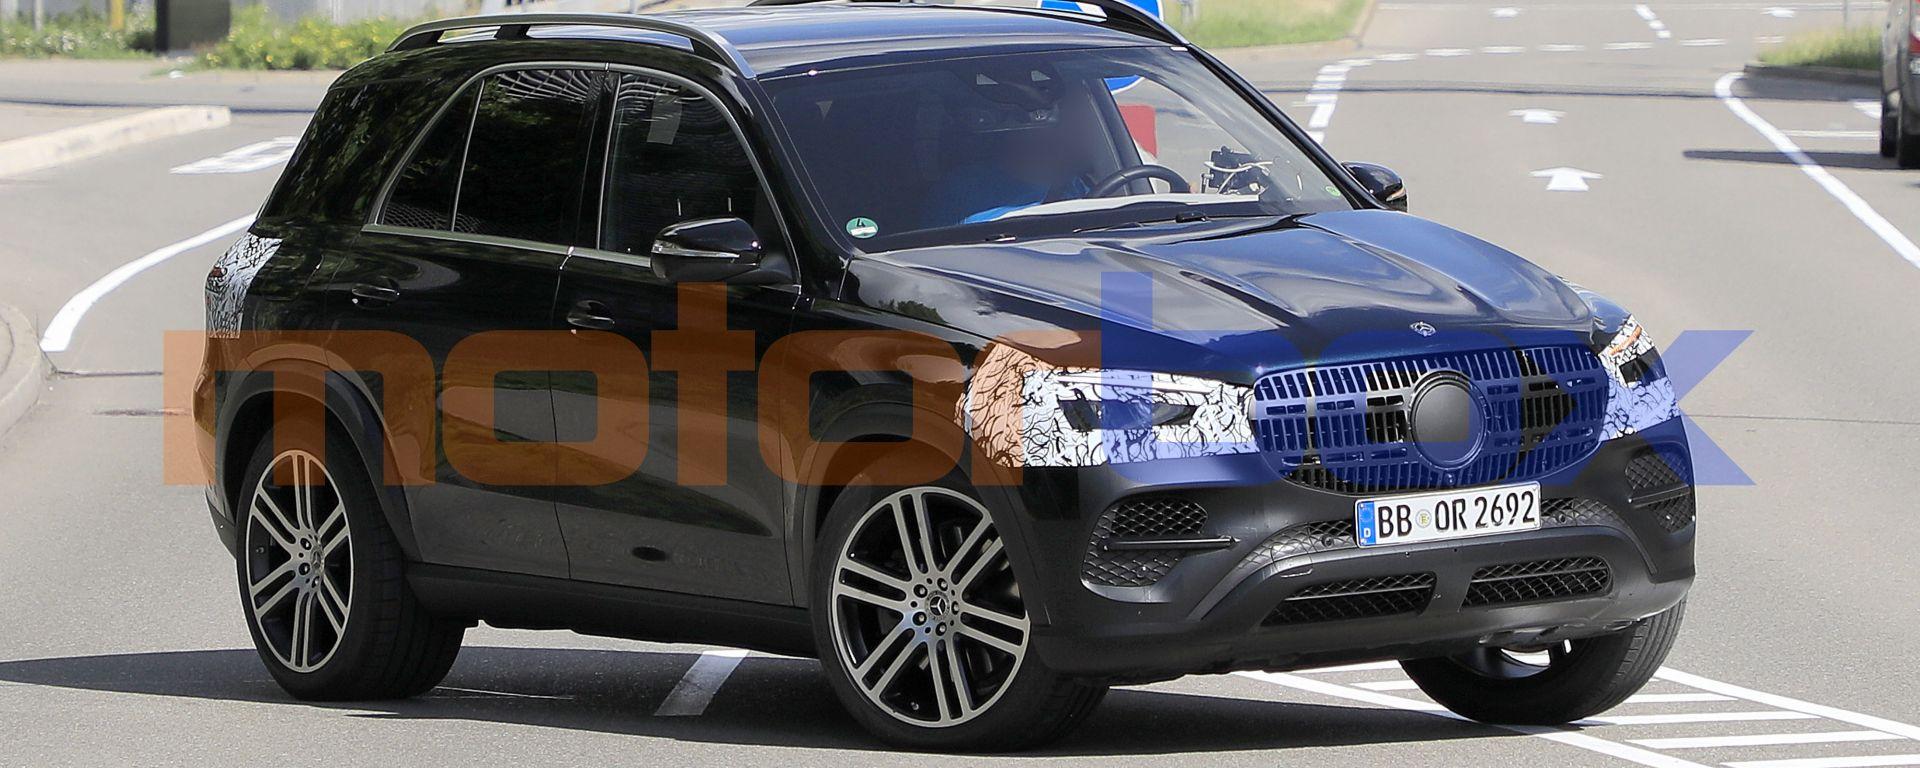 Nuova Mercedes GLE: i prototipi su strada durante i collaudi